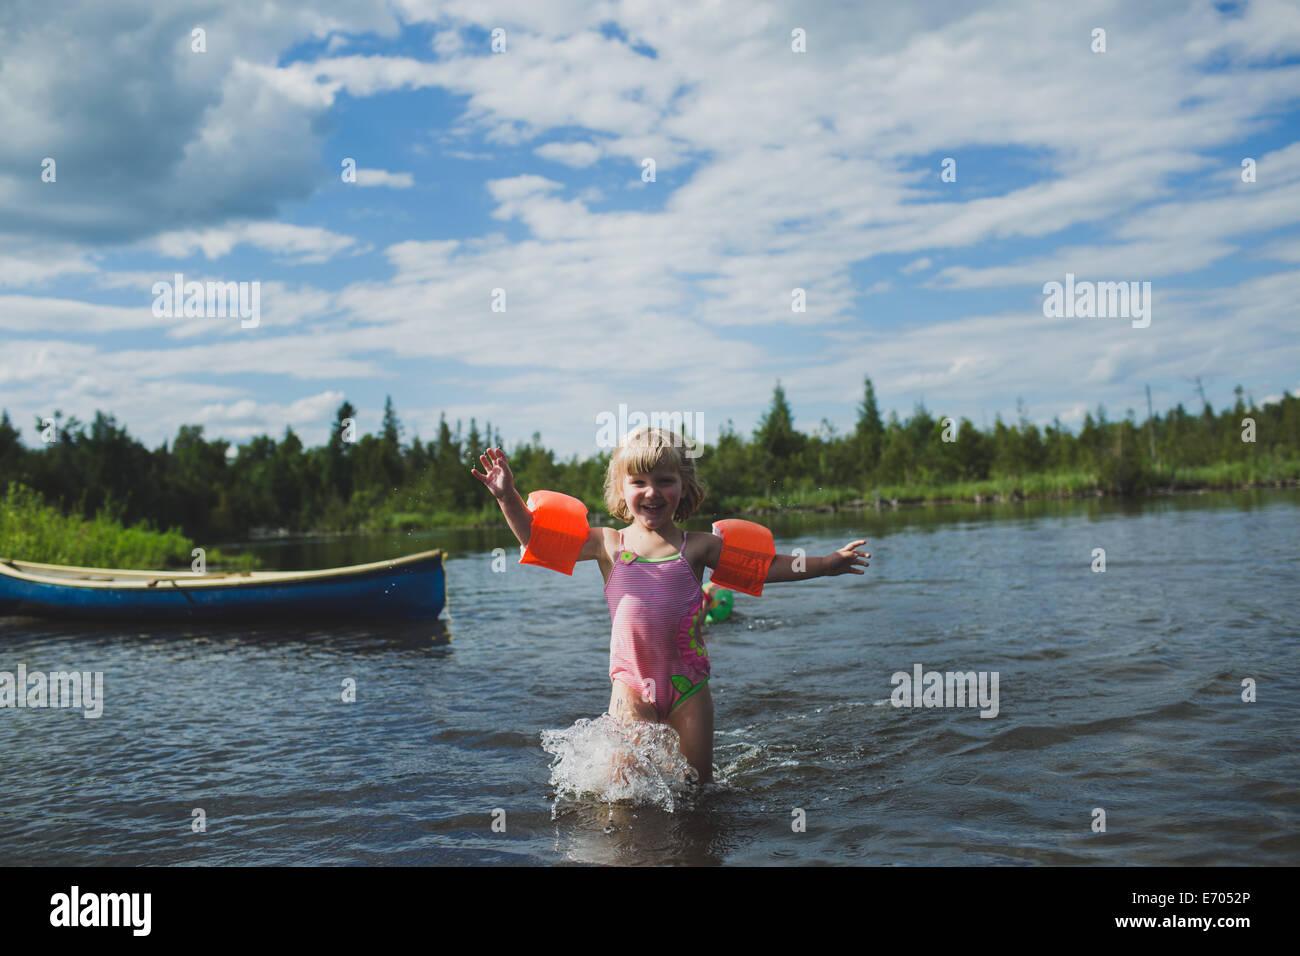 Three year old girl splashing in Indian river, Ontario, Canada - Stock Image